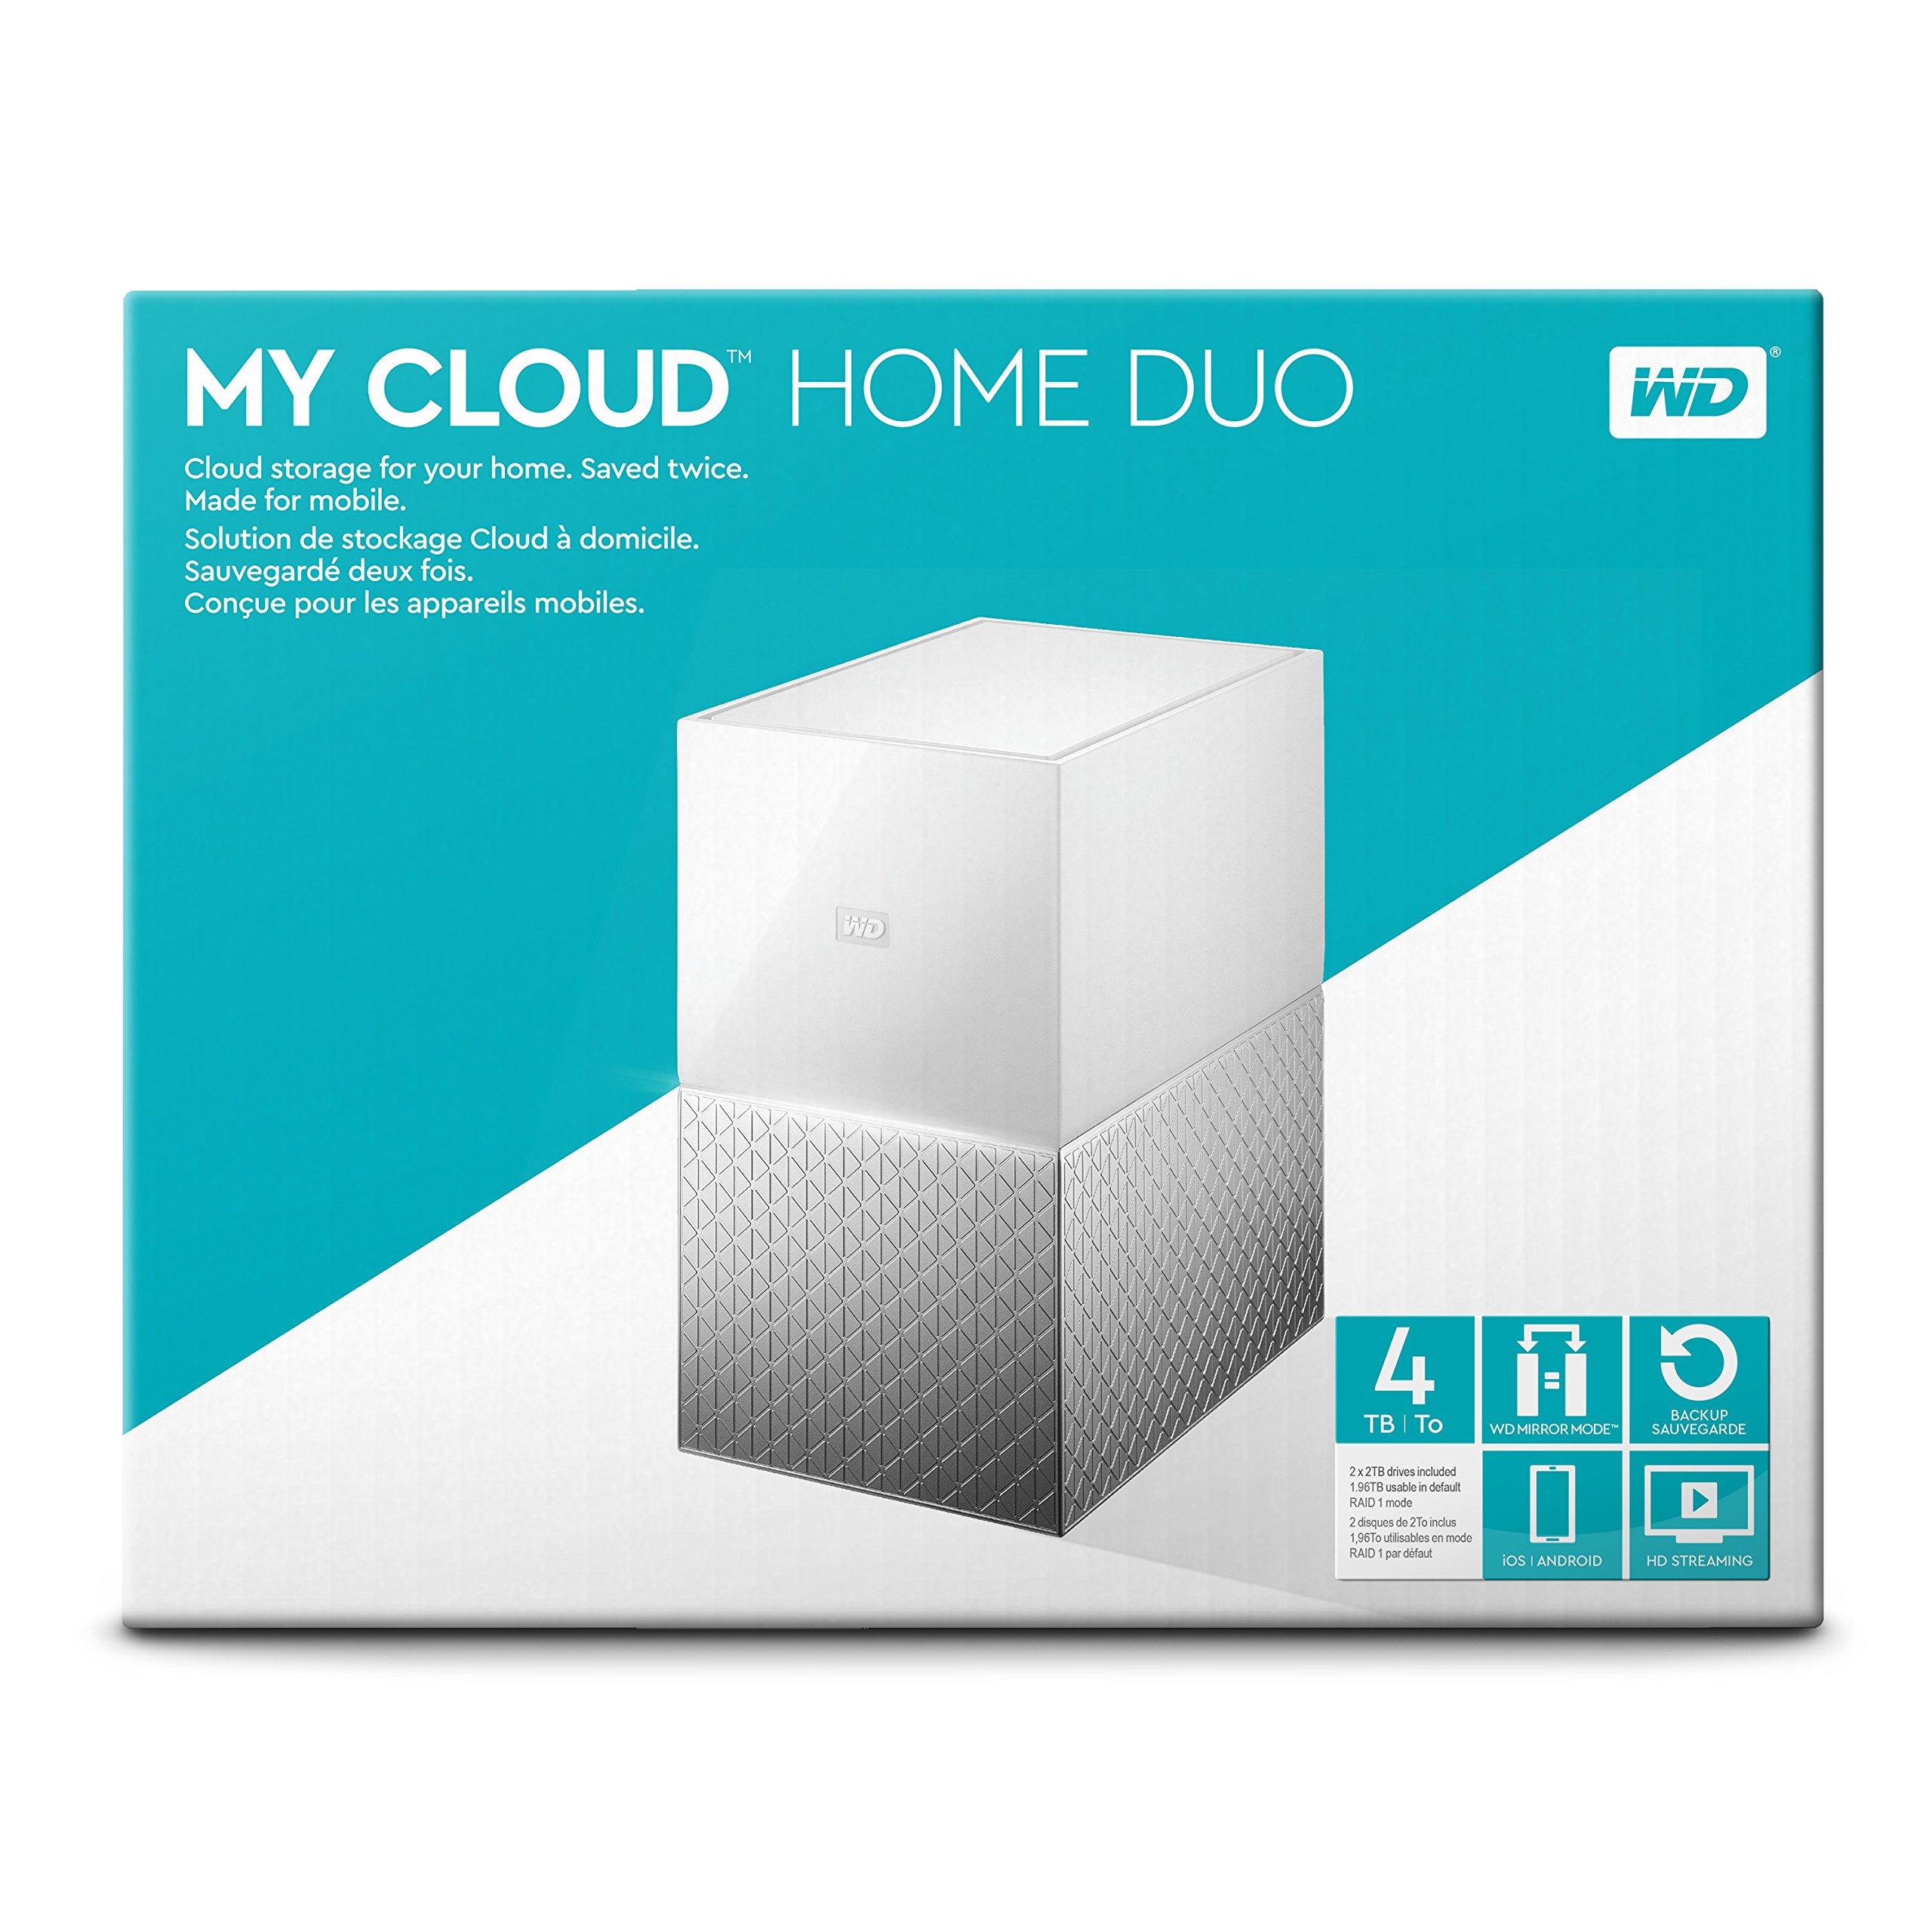 WD 8TB My Cloud Home Duo Personal Cloud Storage - Dual Drive - WDBMUT0080JWT-NESN